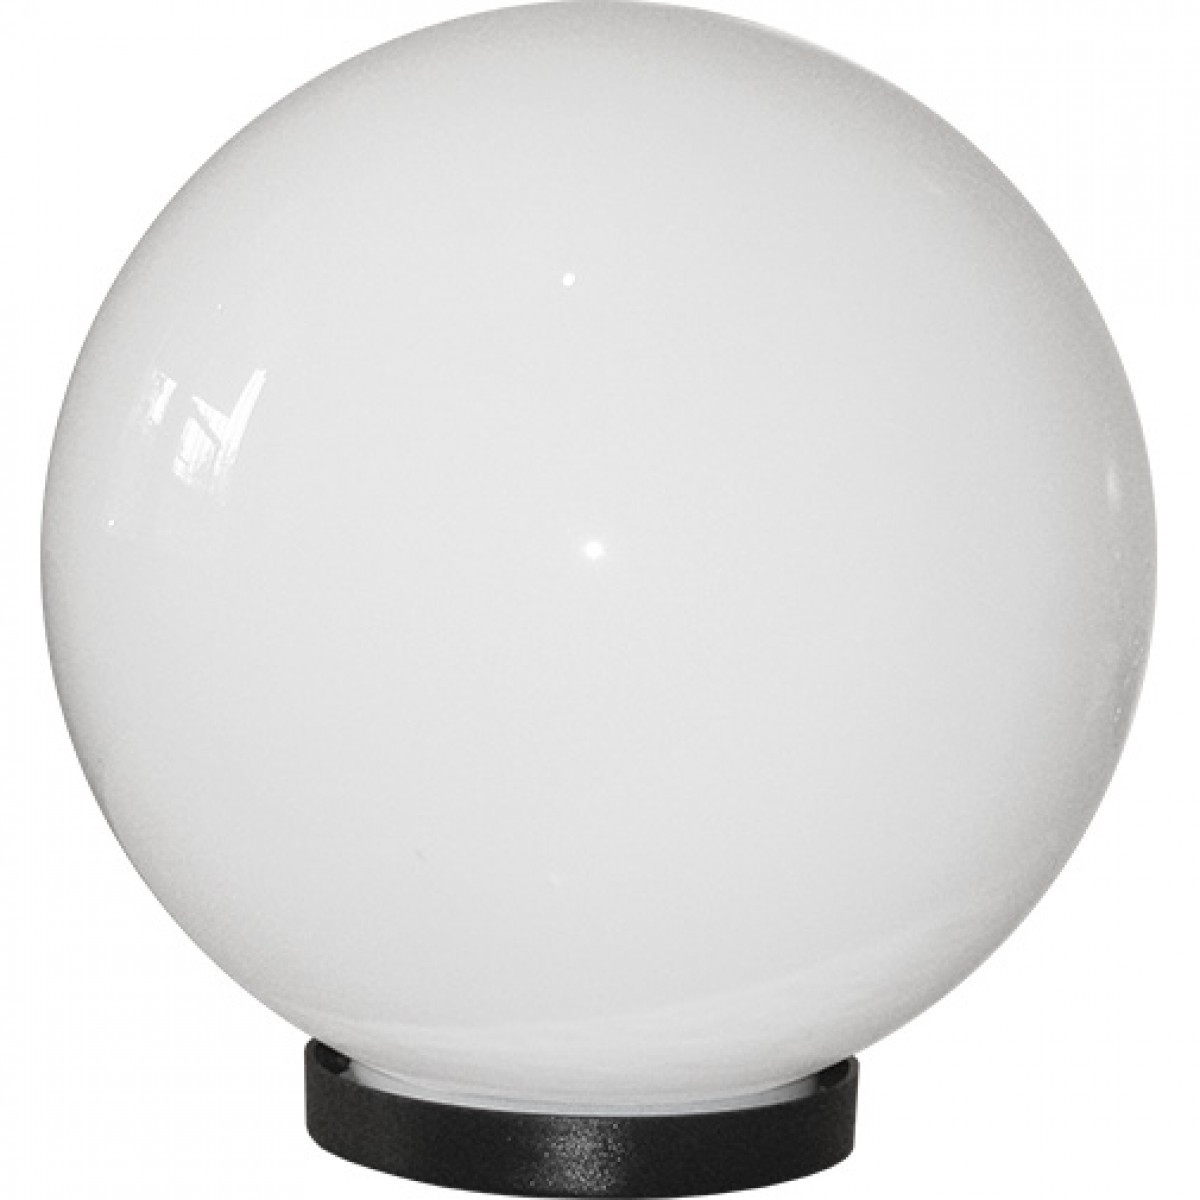 Светильник ШАР д 400 Opal Megalux (TS)